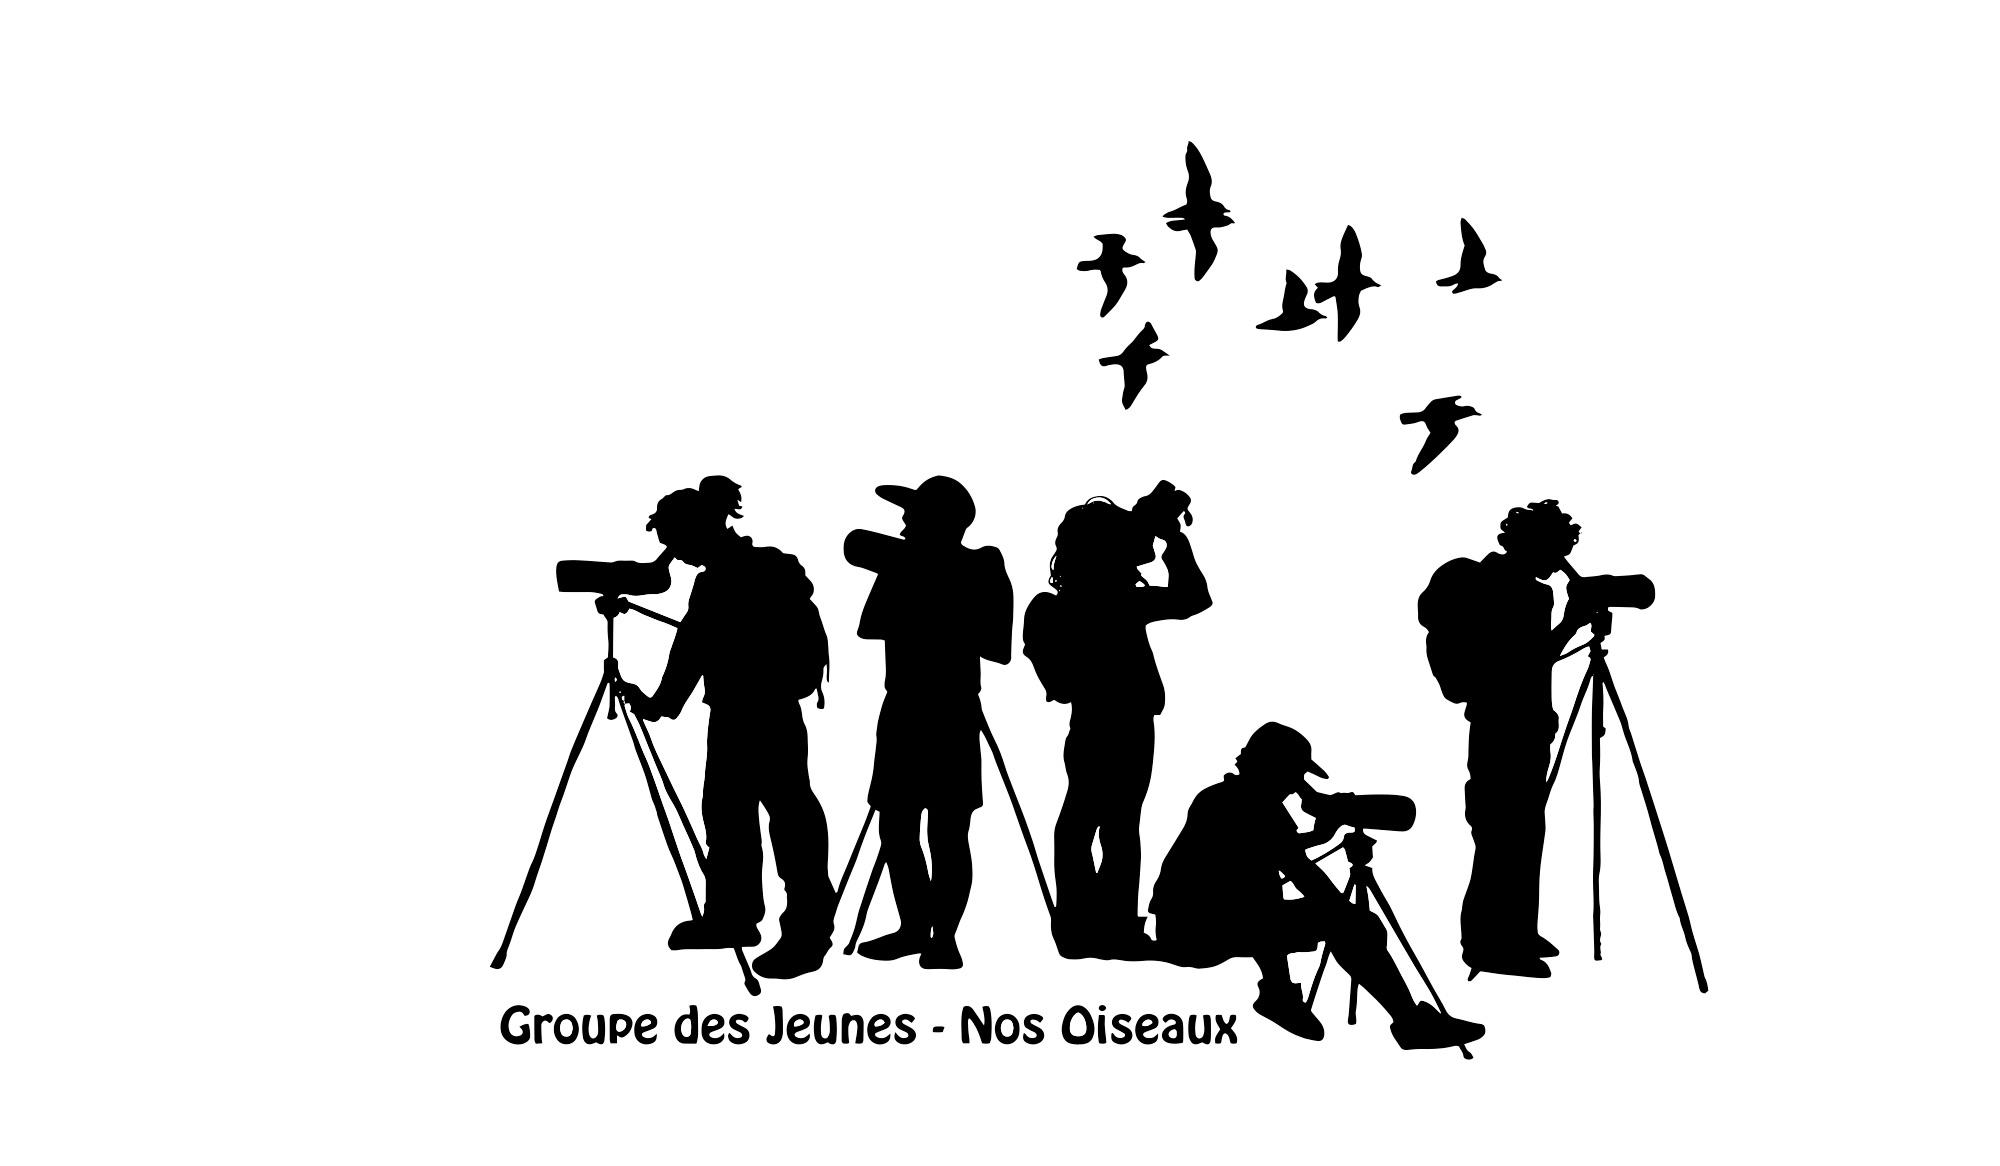 https://cdnfiles2.biolovision.net/gdj.nosoiseaux.ch/userfiles/GDJLogo.jpg